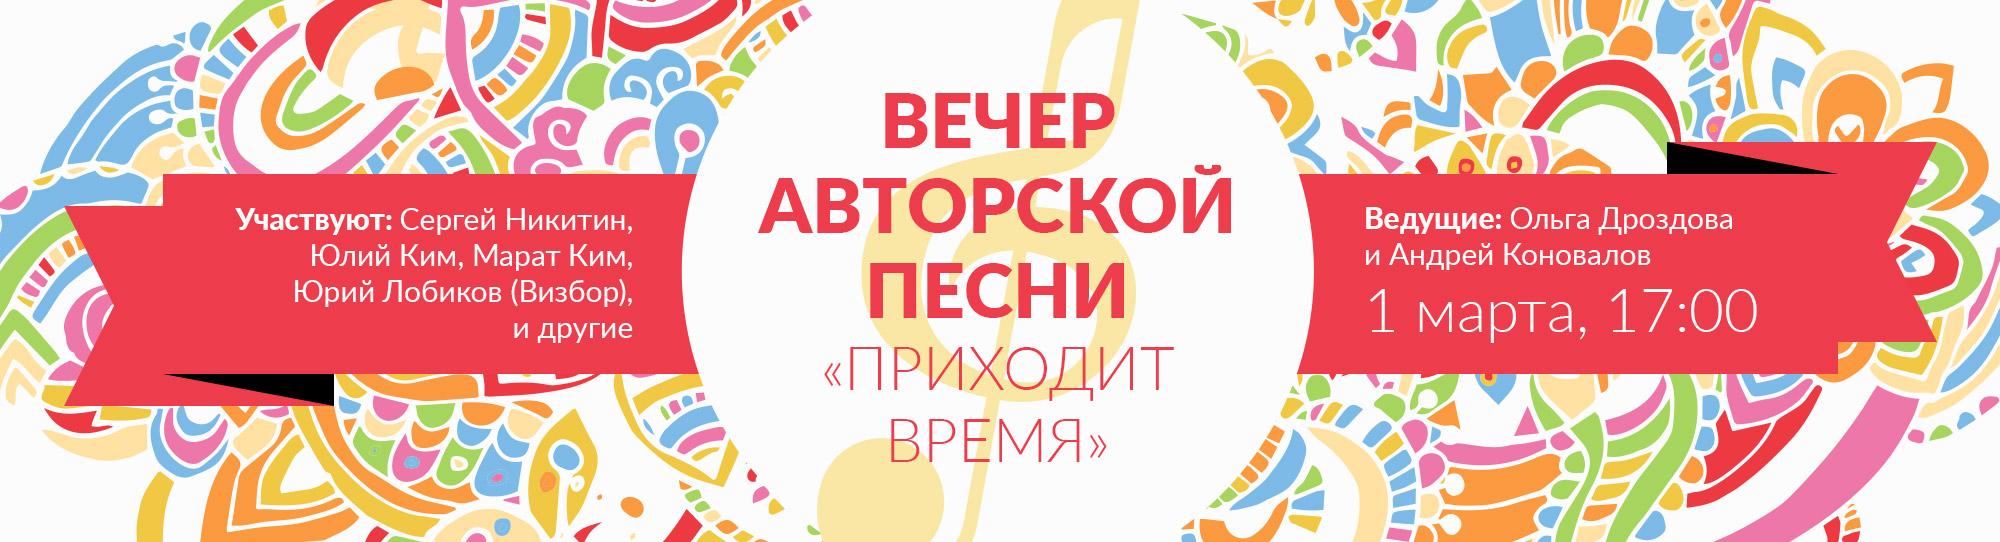 mpgu-site-big-banner-Avtorskaya-pesnya4